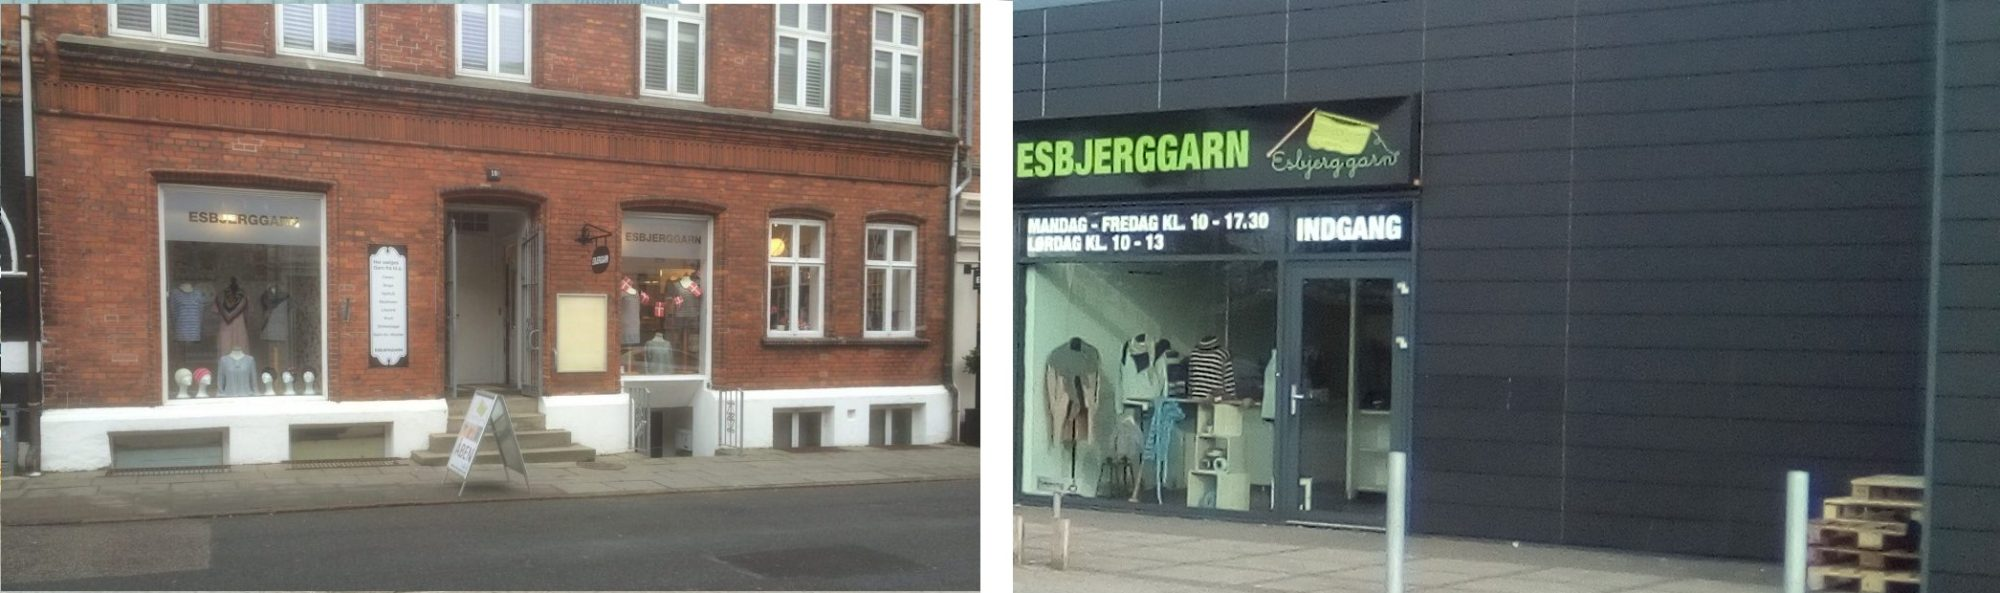 Esbjerggarn